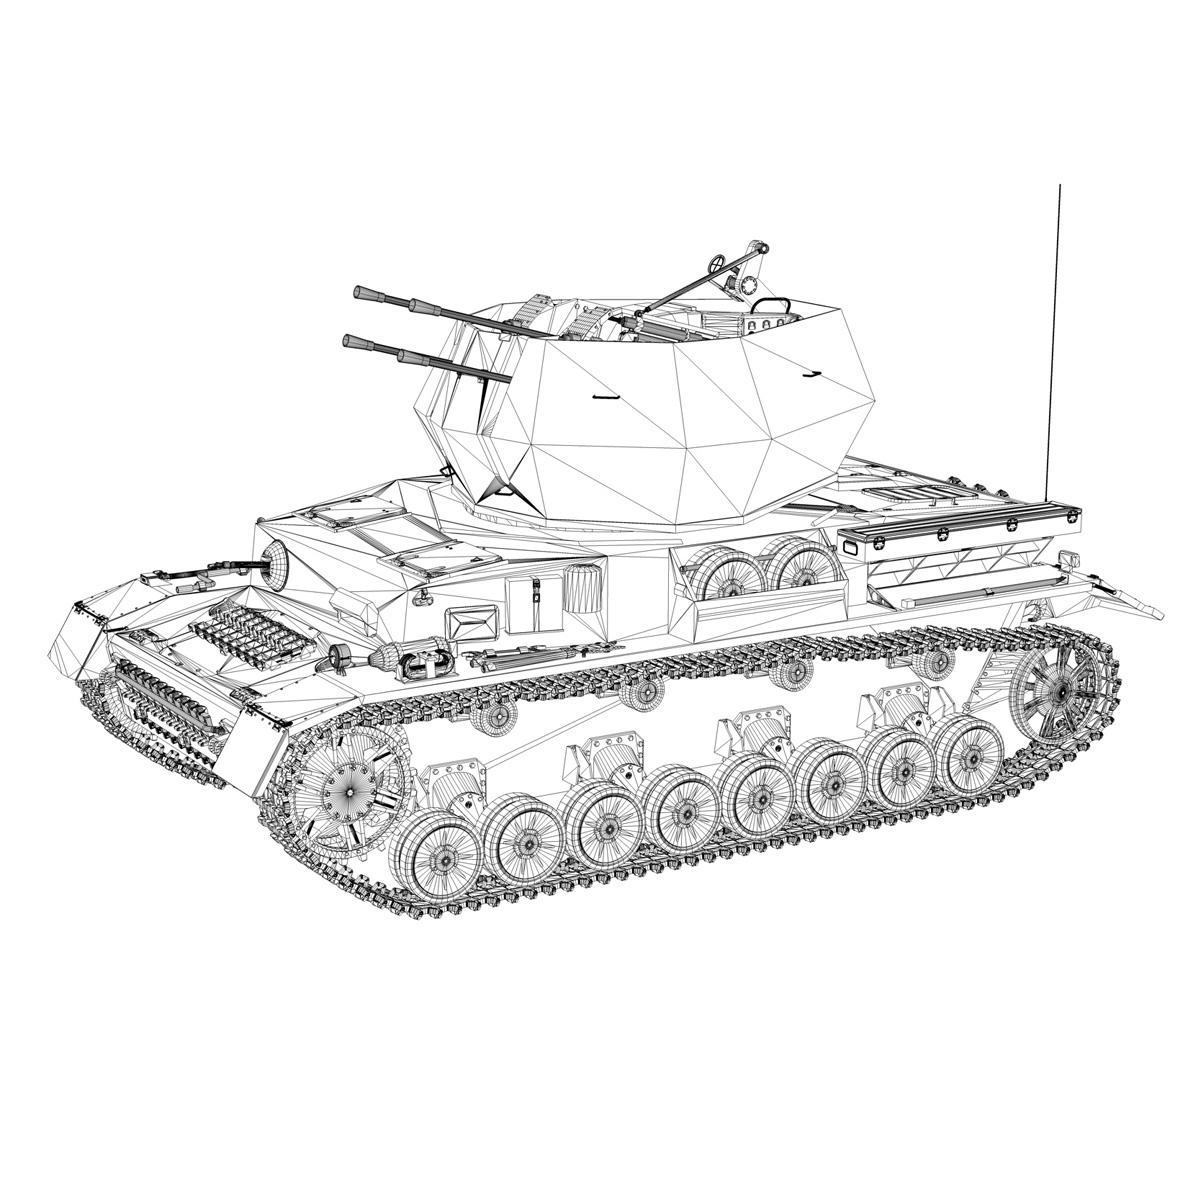 flakpanzer iv – wirbelwind – spzjgabt 654 3d model 3ds fbx c4d lwo obj 282317